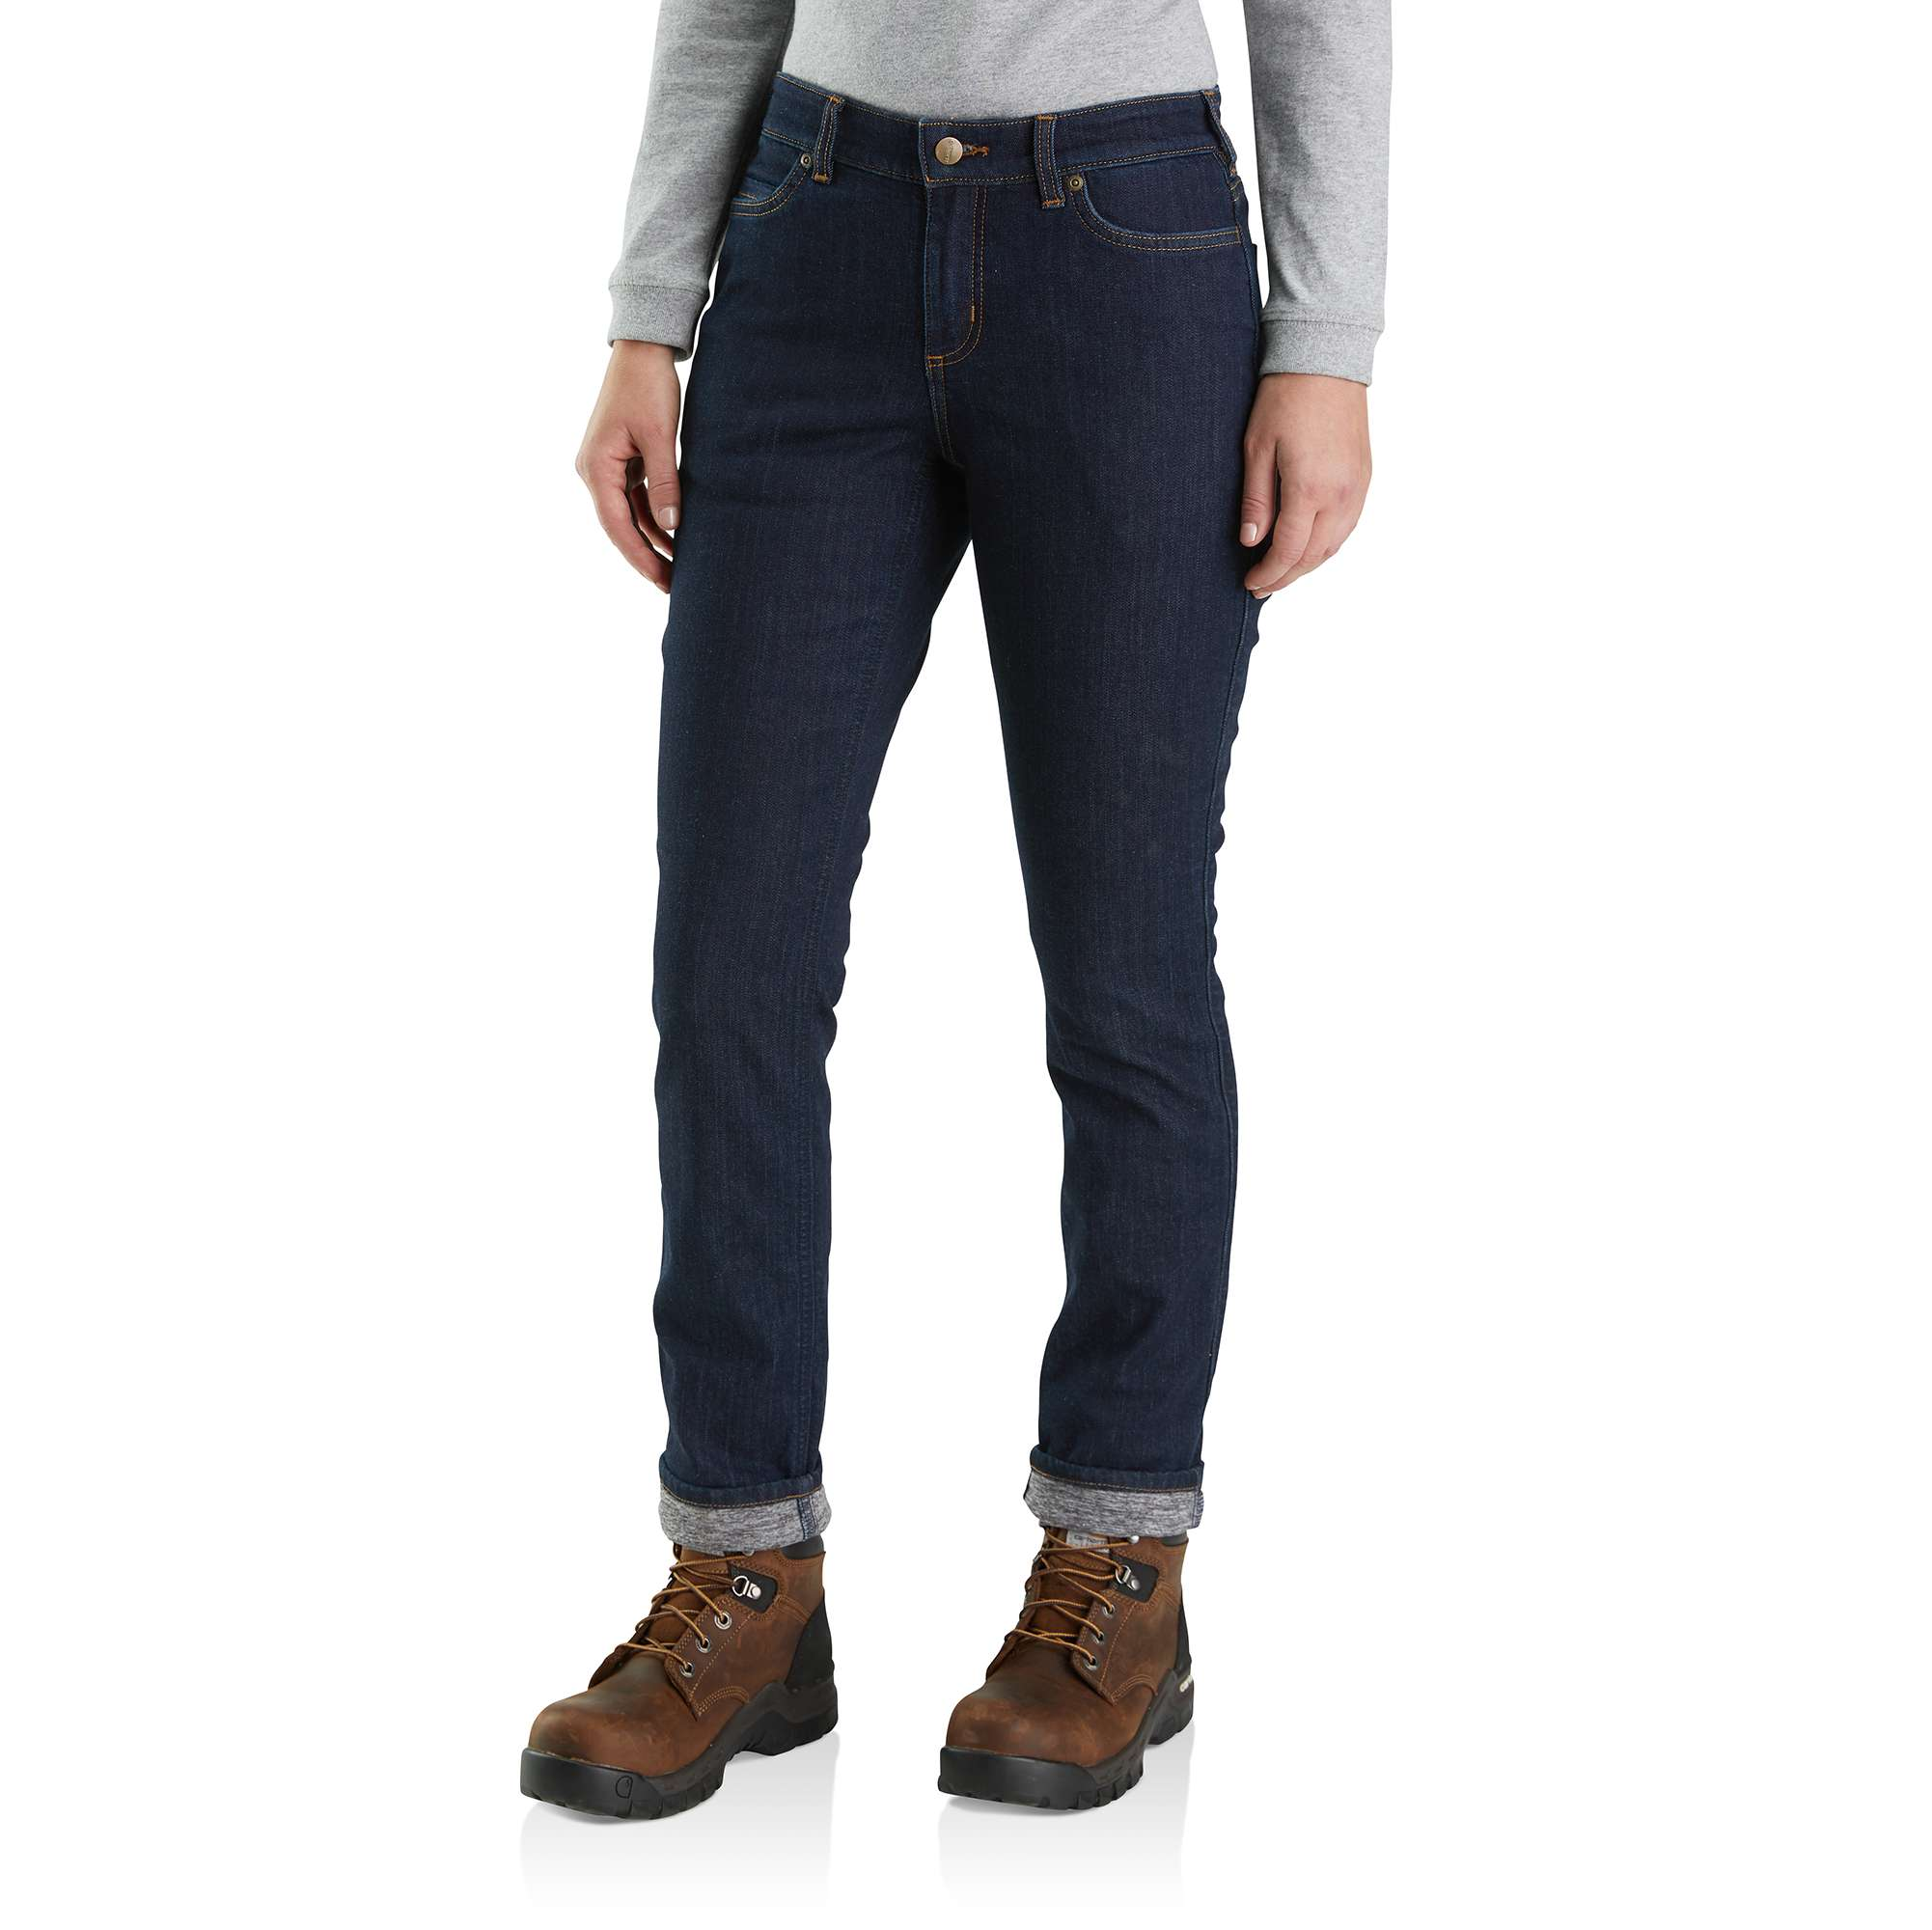 Carhartt Straight Leg Lined Jean